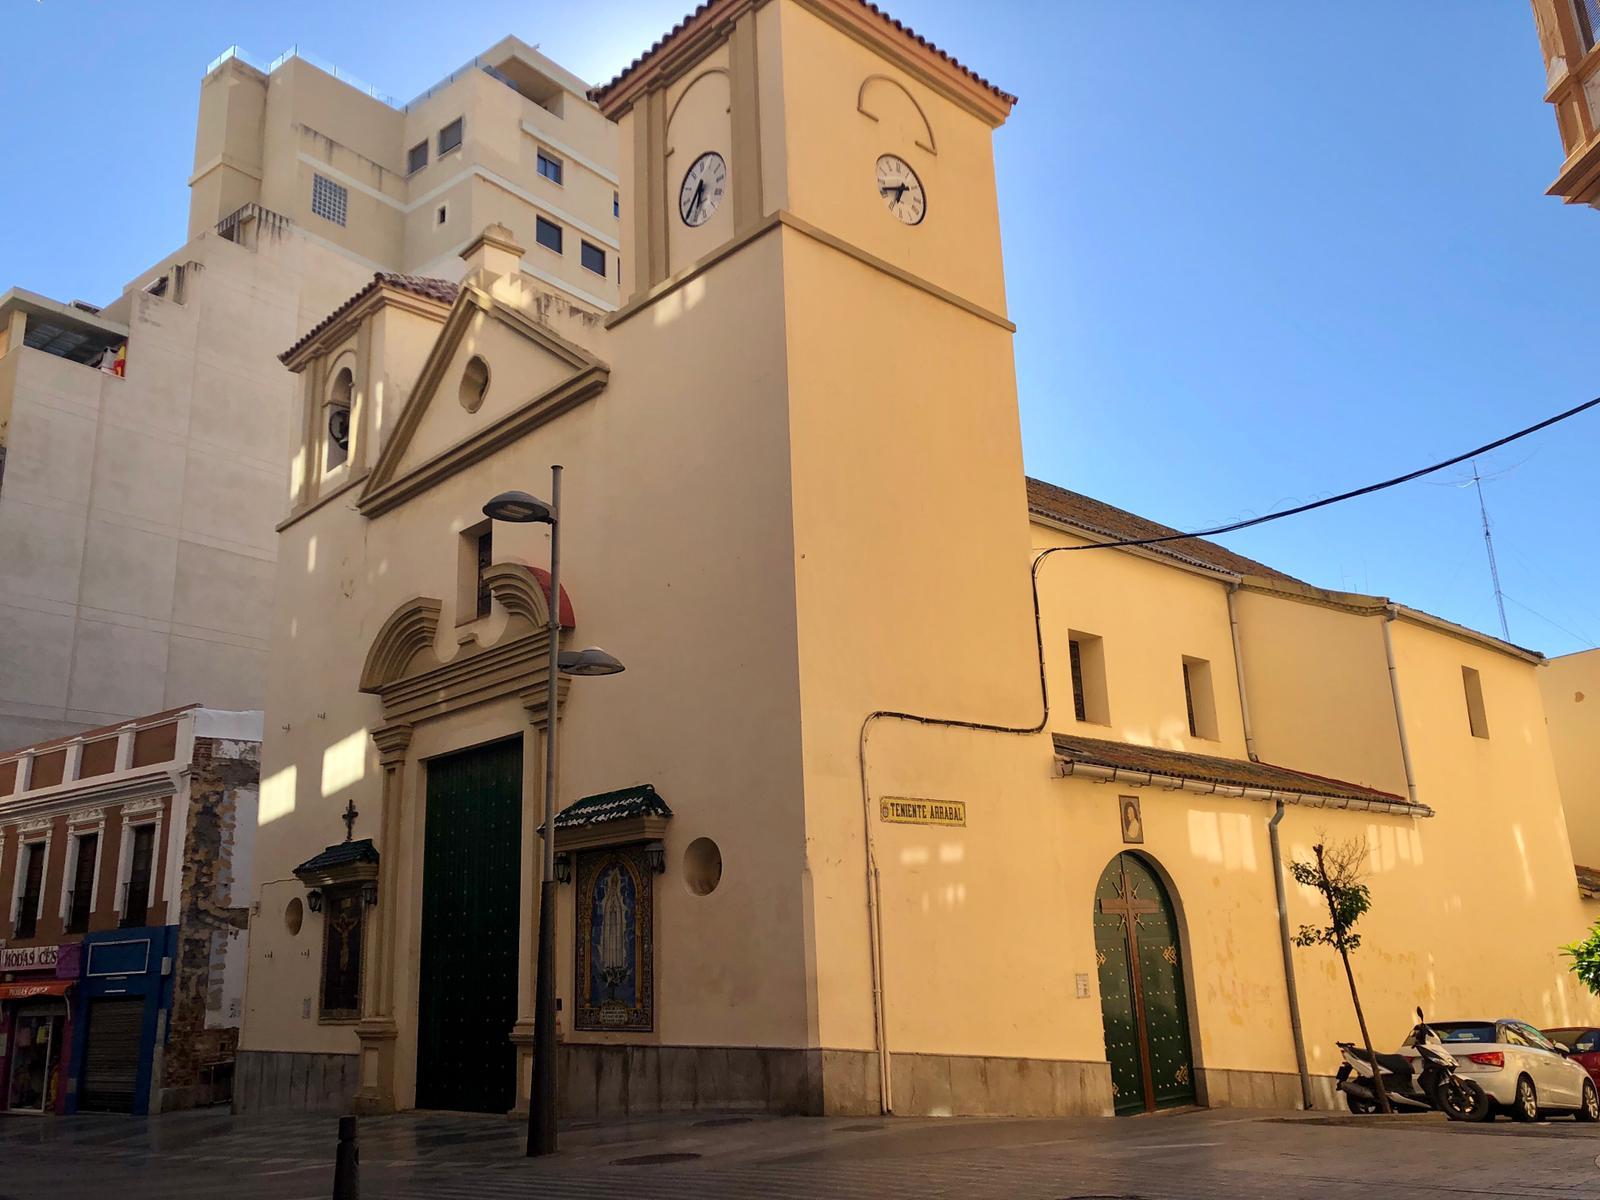 Parroquia Ntra. Sra. de los Remedios, Ceuta